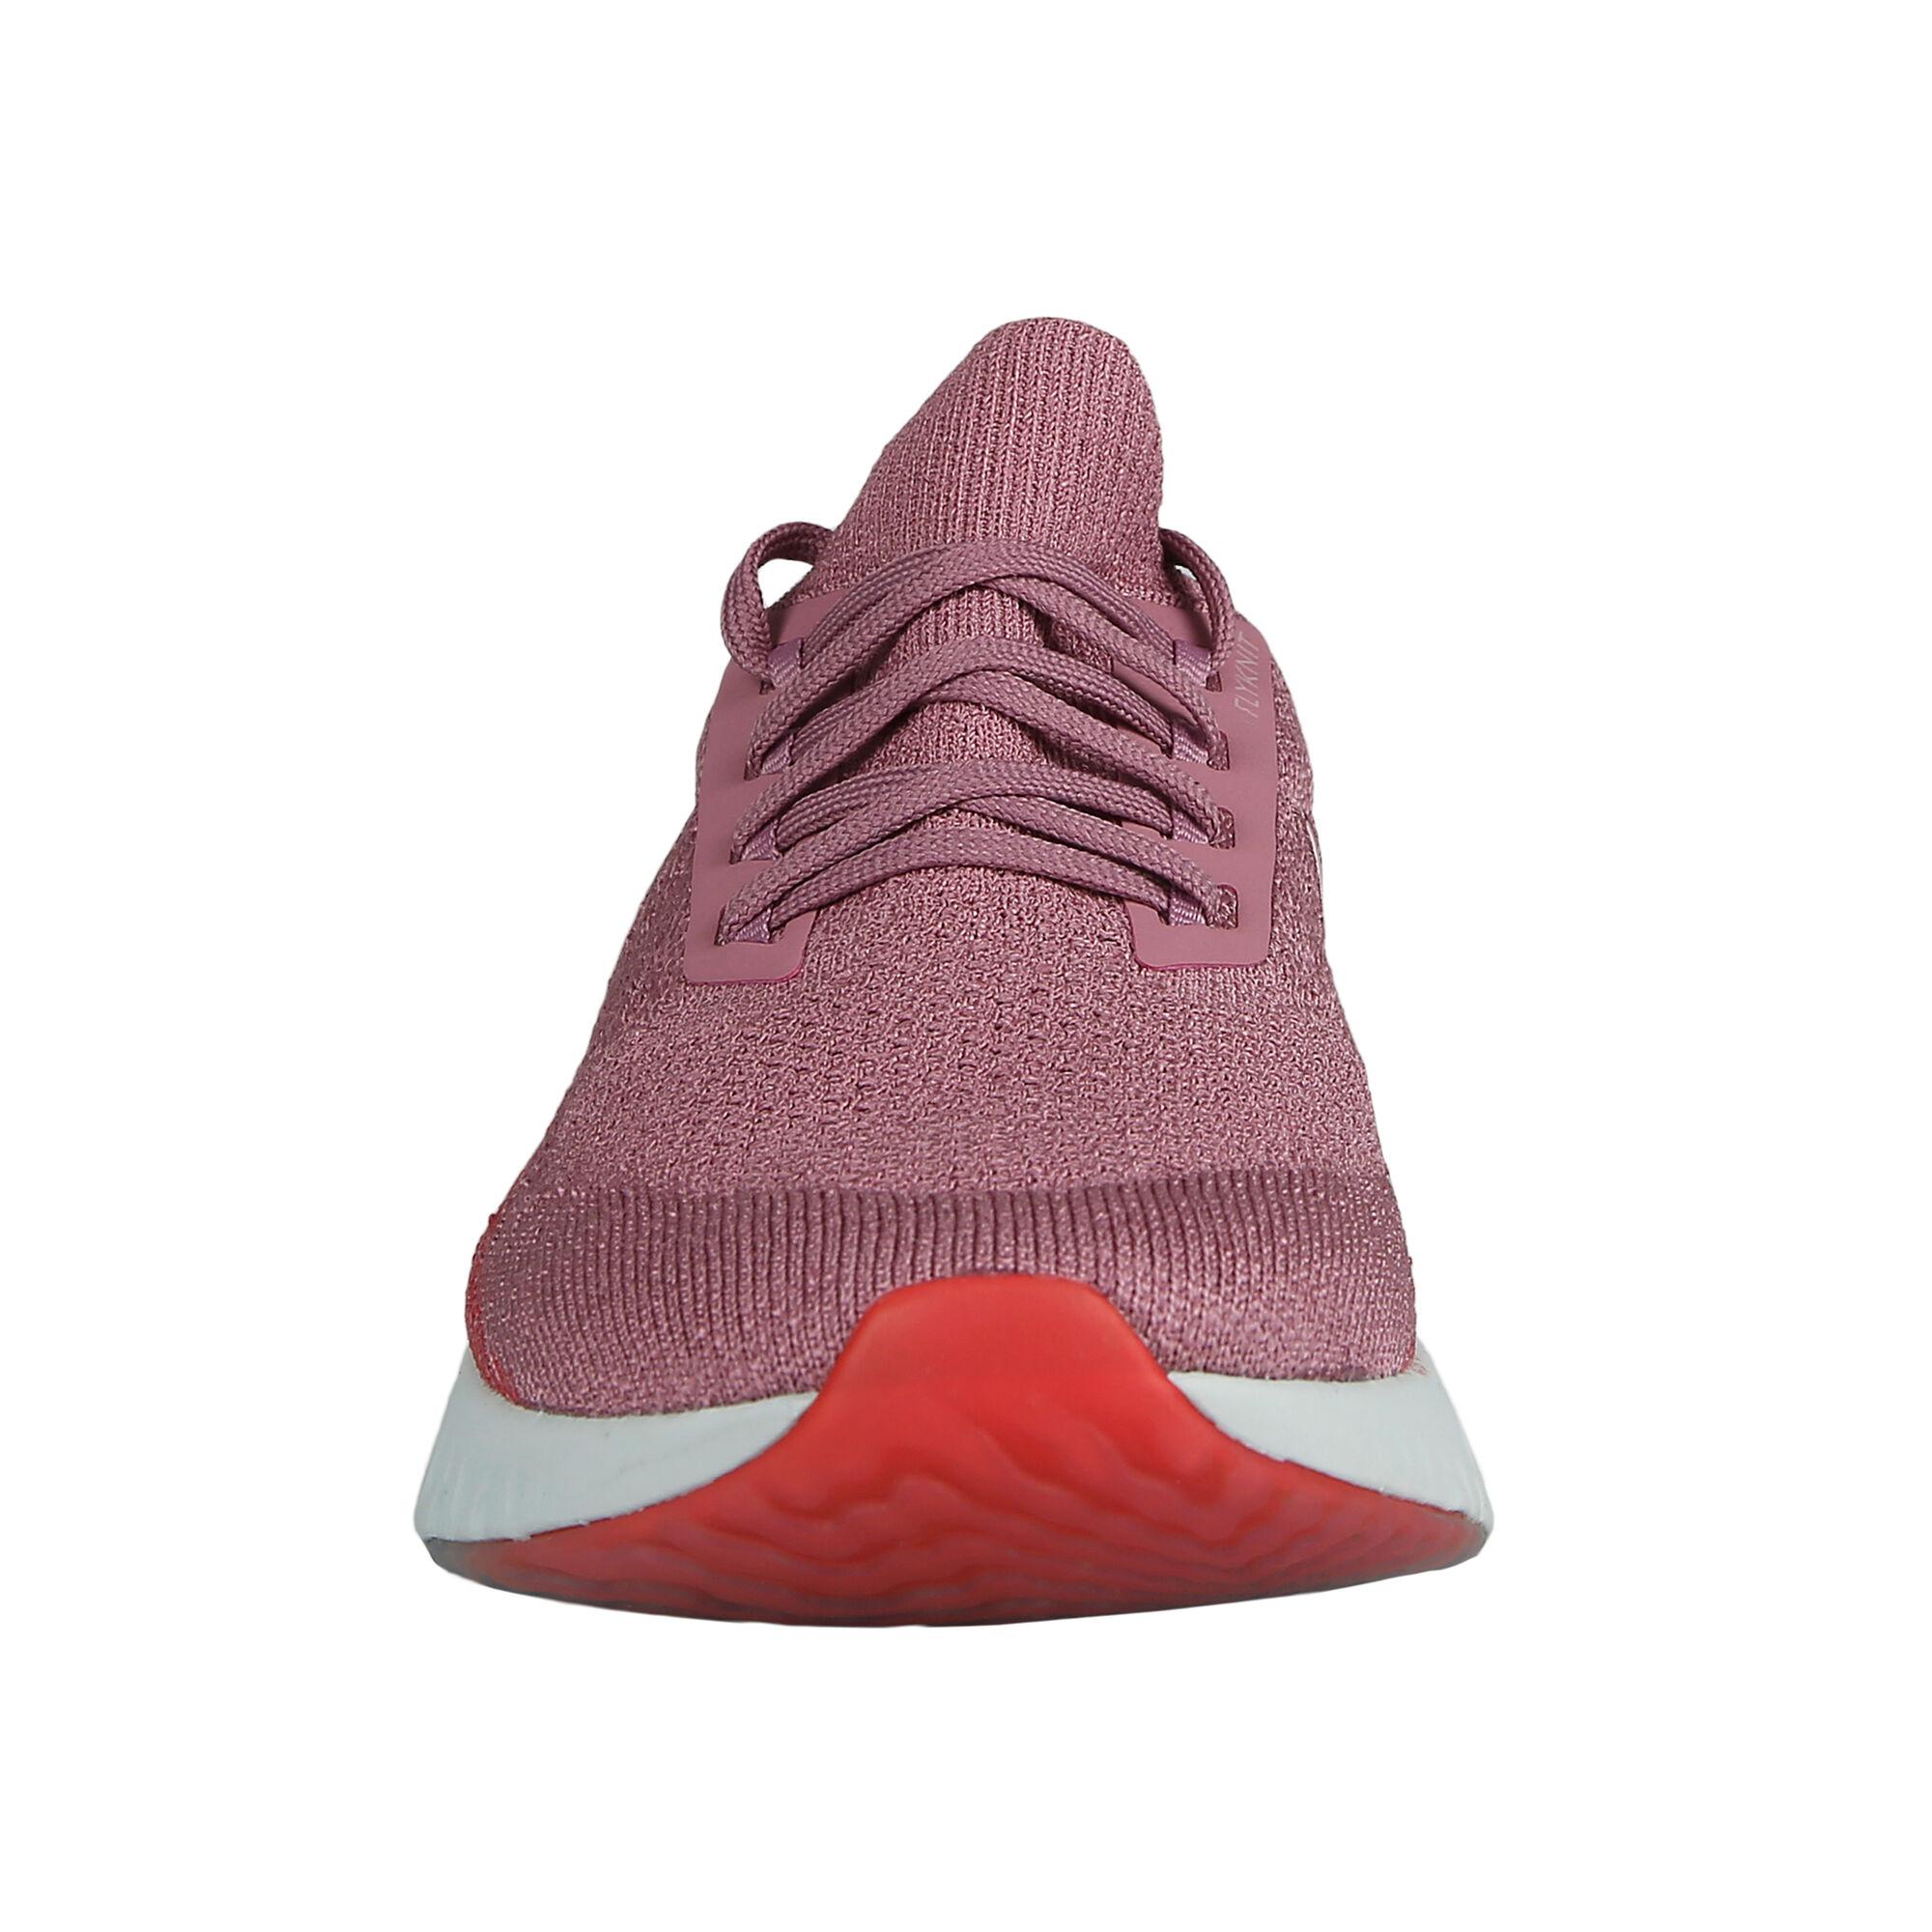 f4a8326d0186 buy Nike Epic React Flyknit 2 Neutral Running Shoe Women - Violet ...